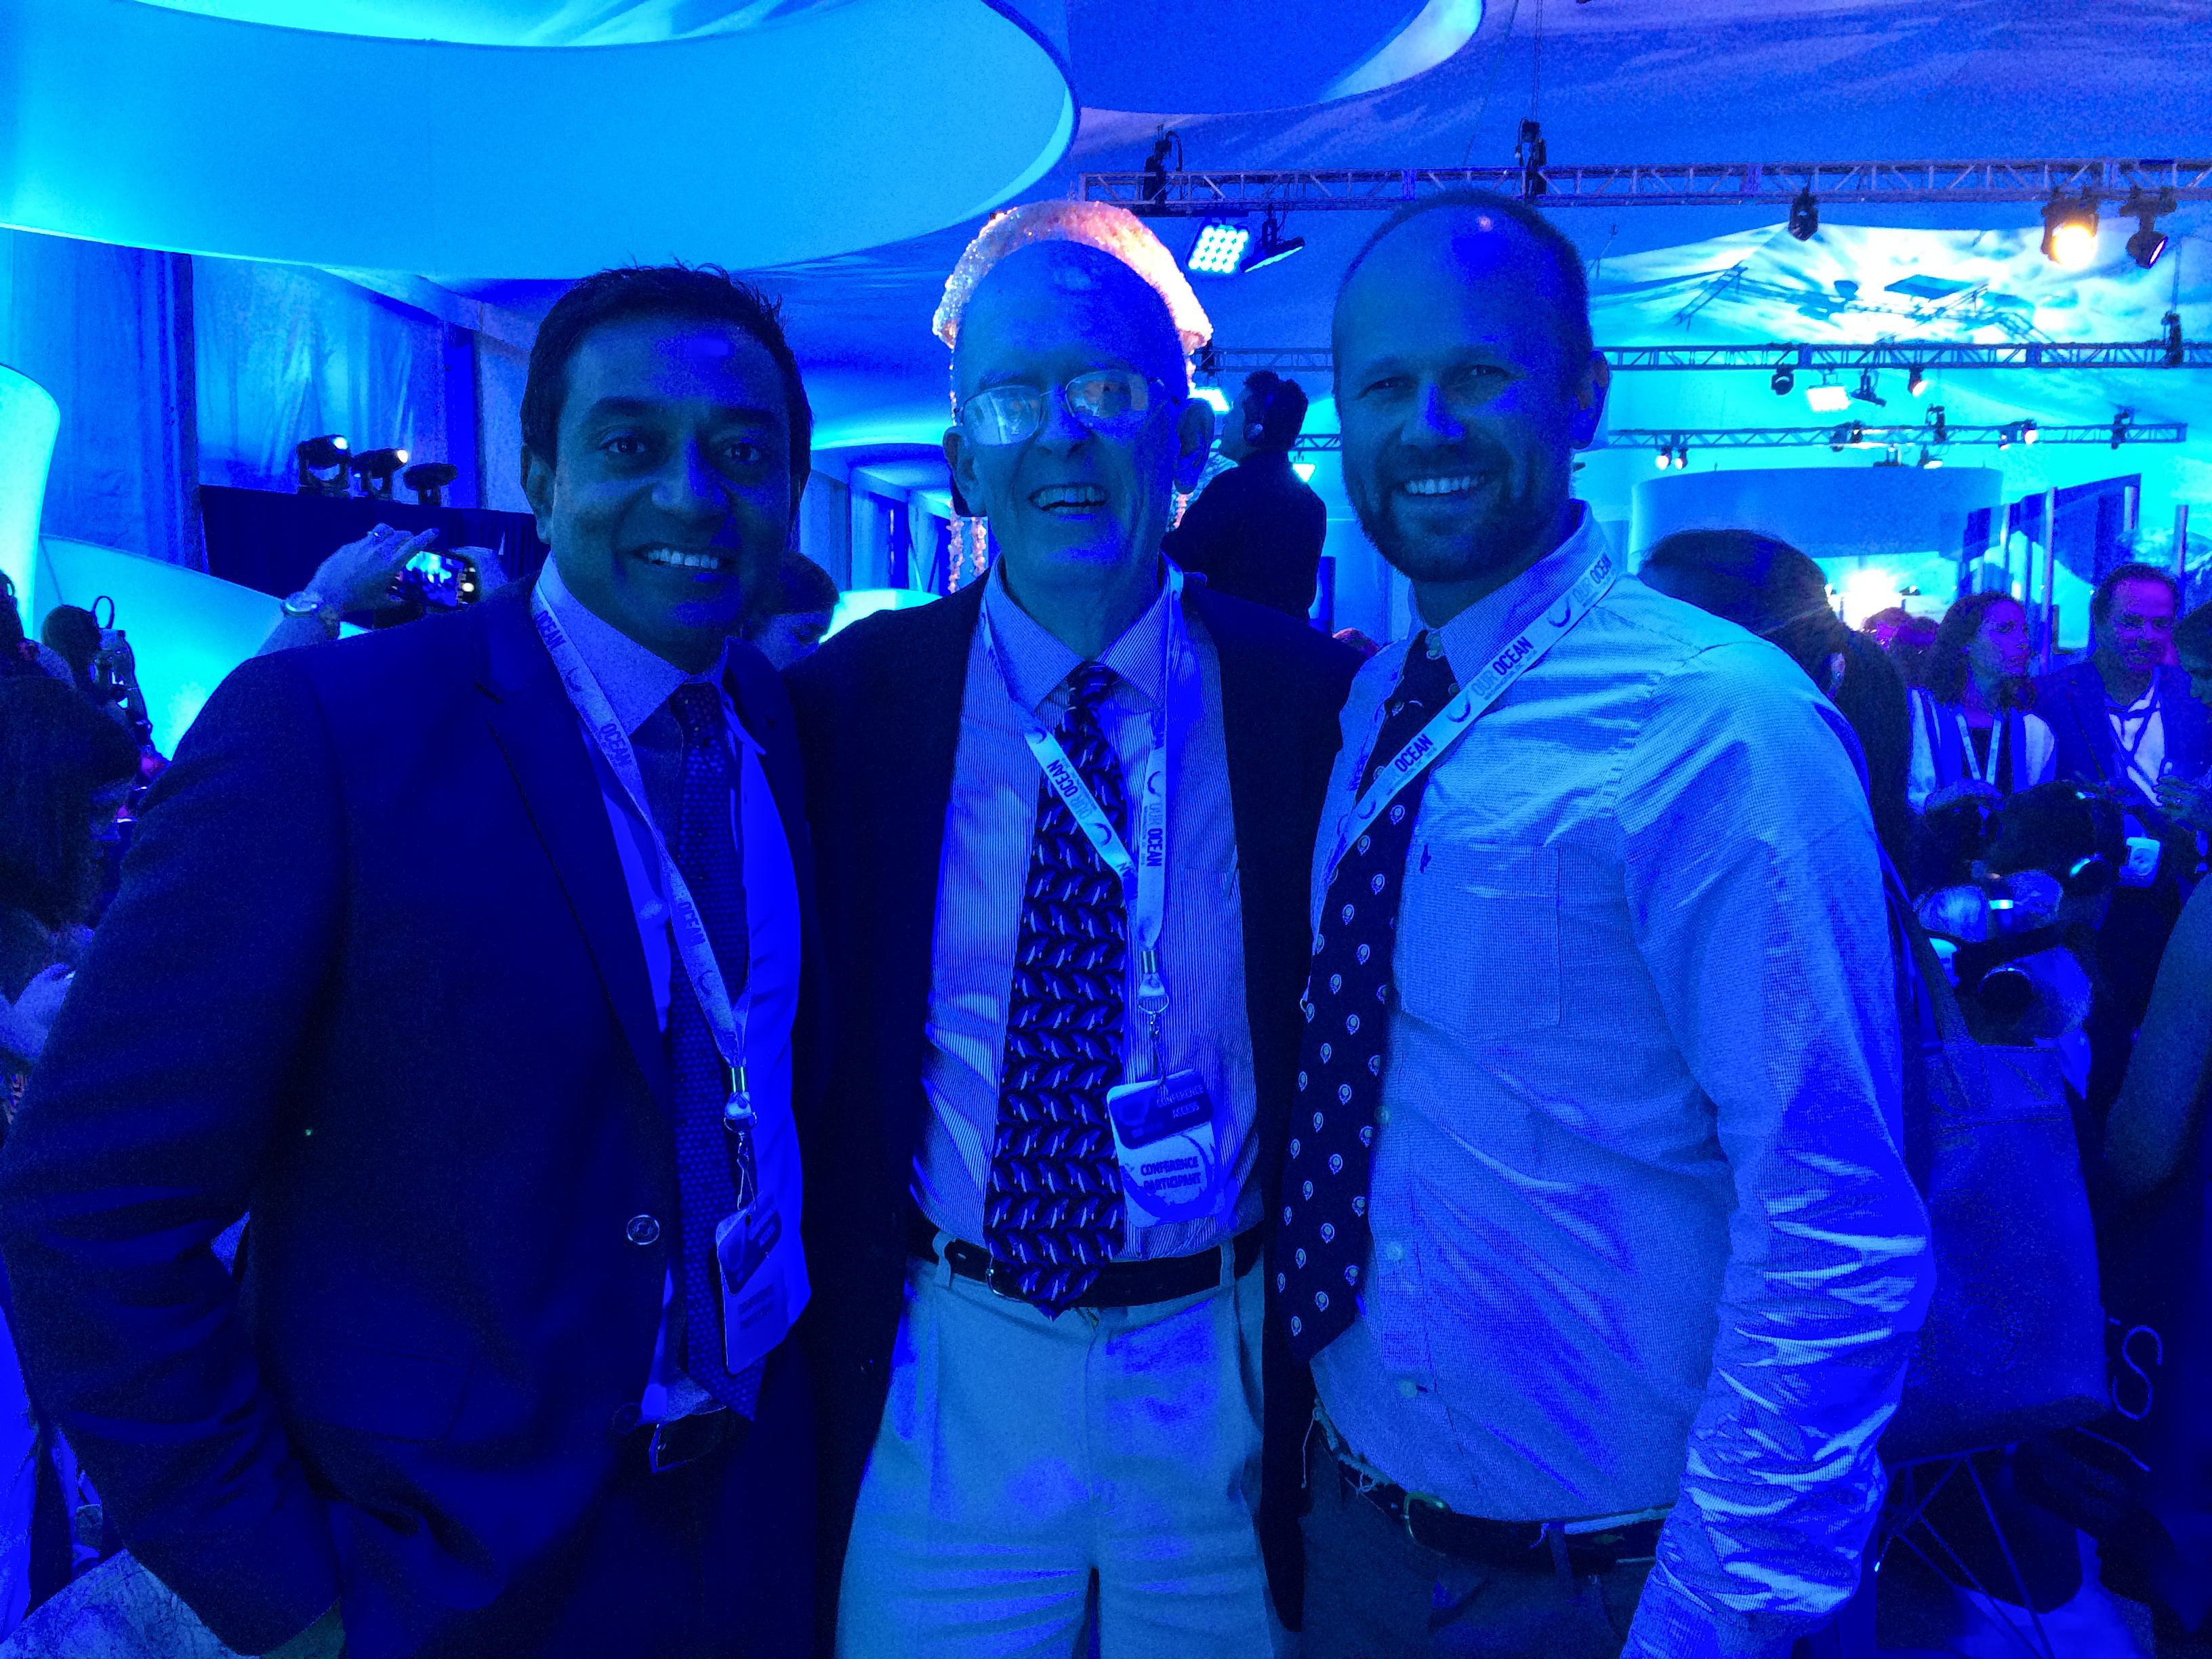 M. Sanjayan (Conservation International), Roger Payne, Andy Rogan